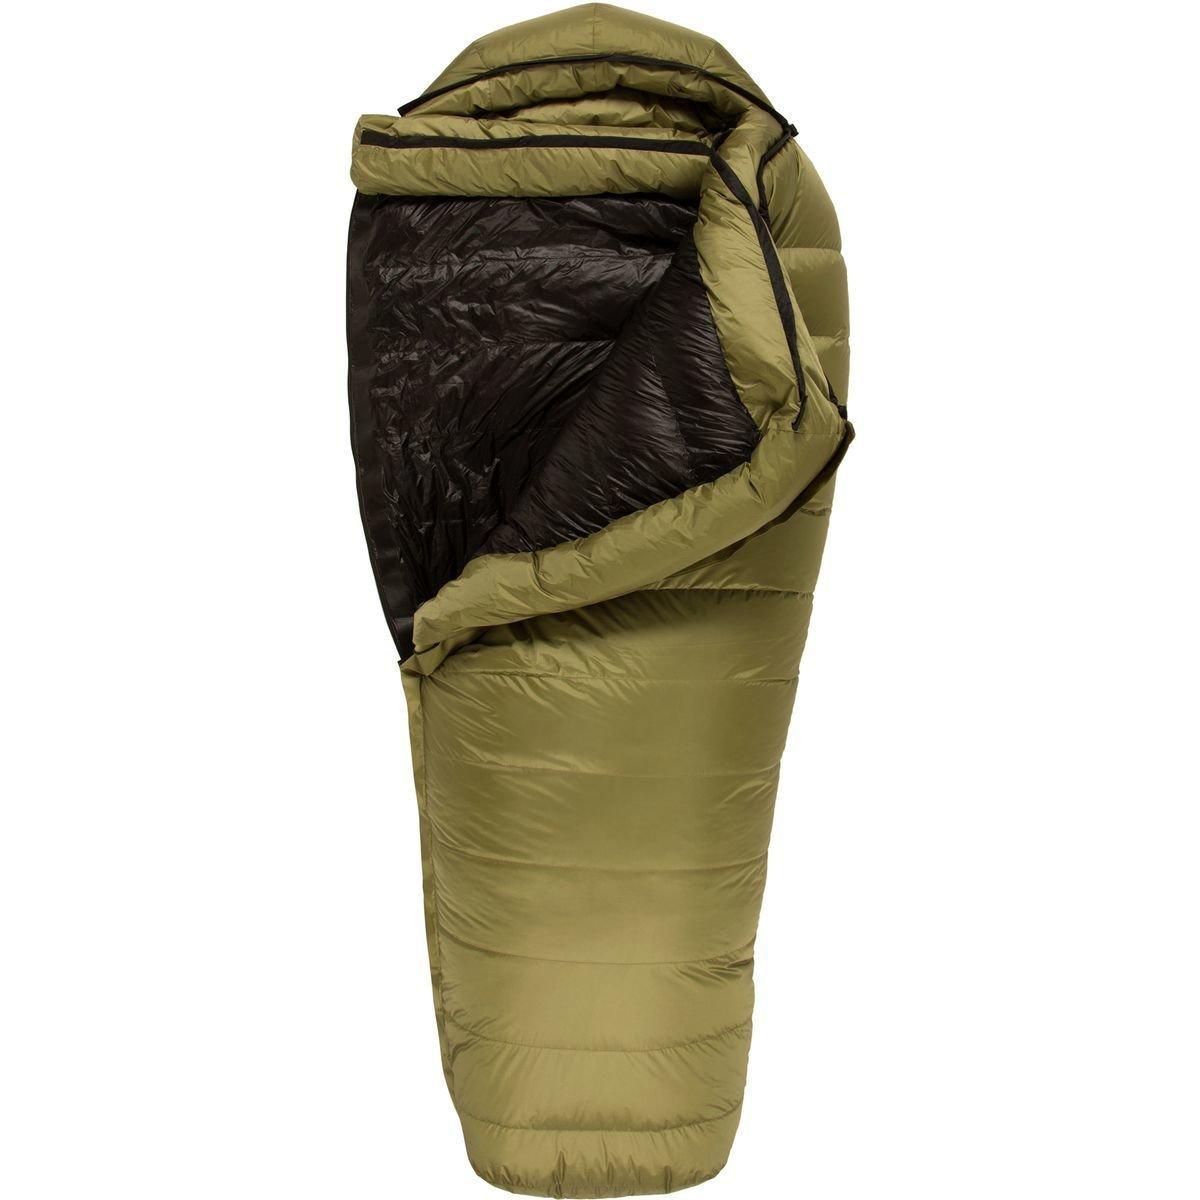 An image of Western Mountaineering Cypress Gore WindStopper Sleeping Bag | Expert Camper